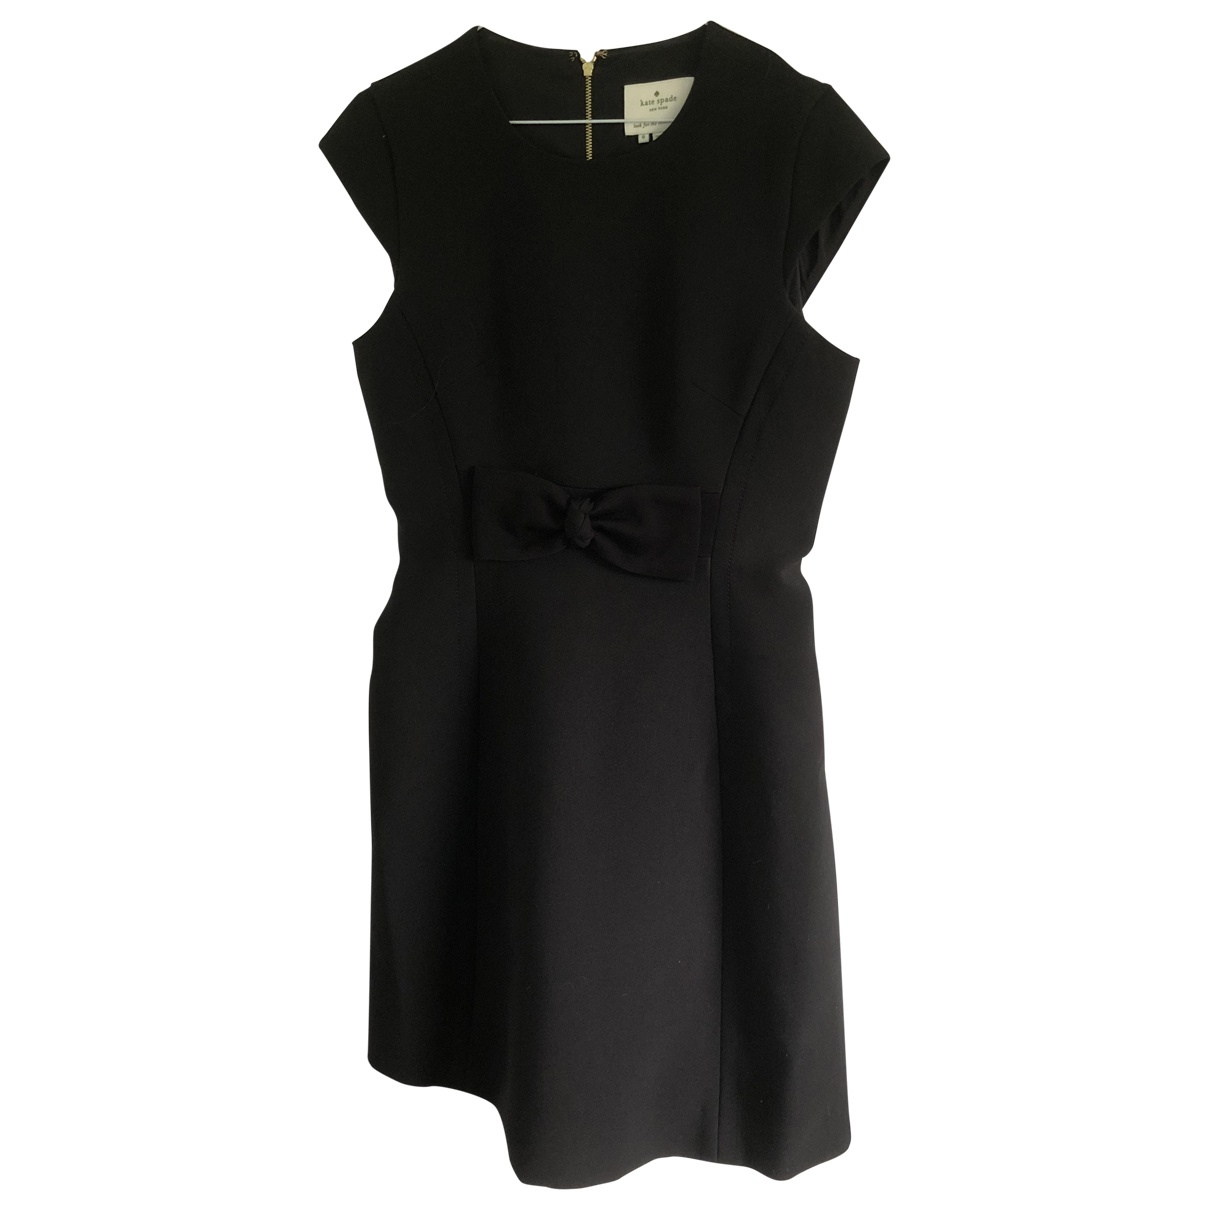 Kate Spade \N Black Cotton dress for Women 6 US